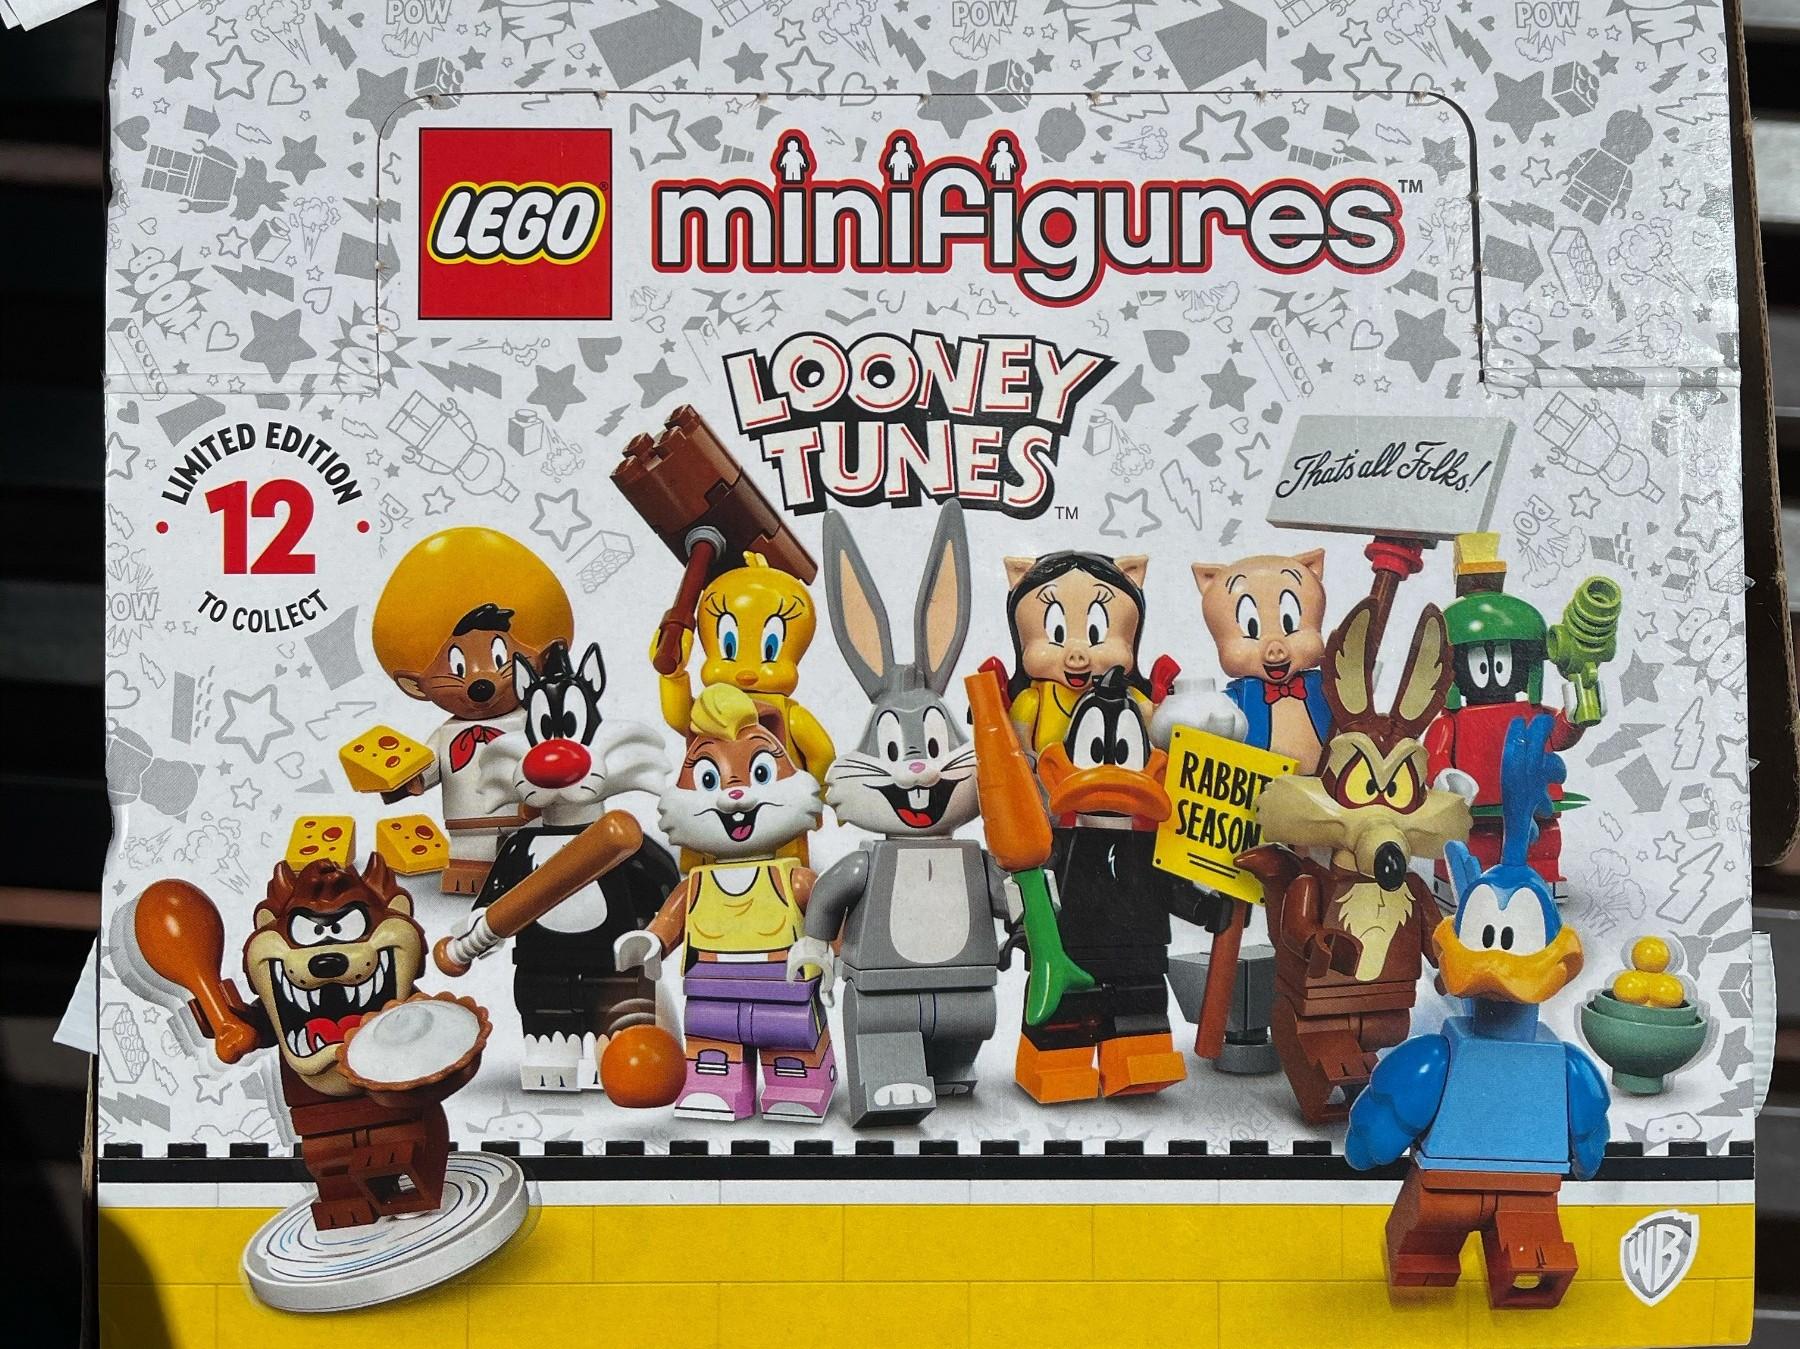 LEGOLooneyTunesMinifigures 1